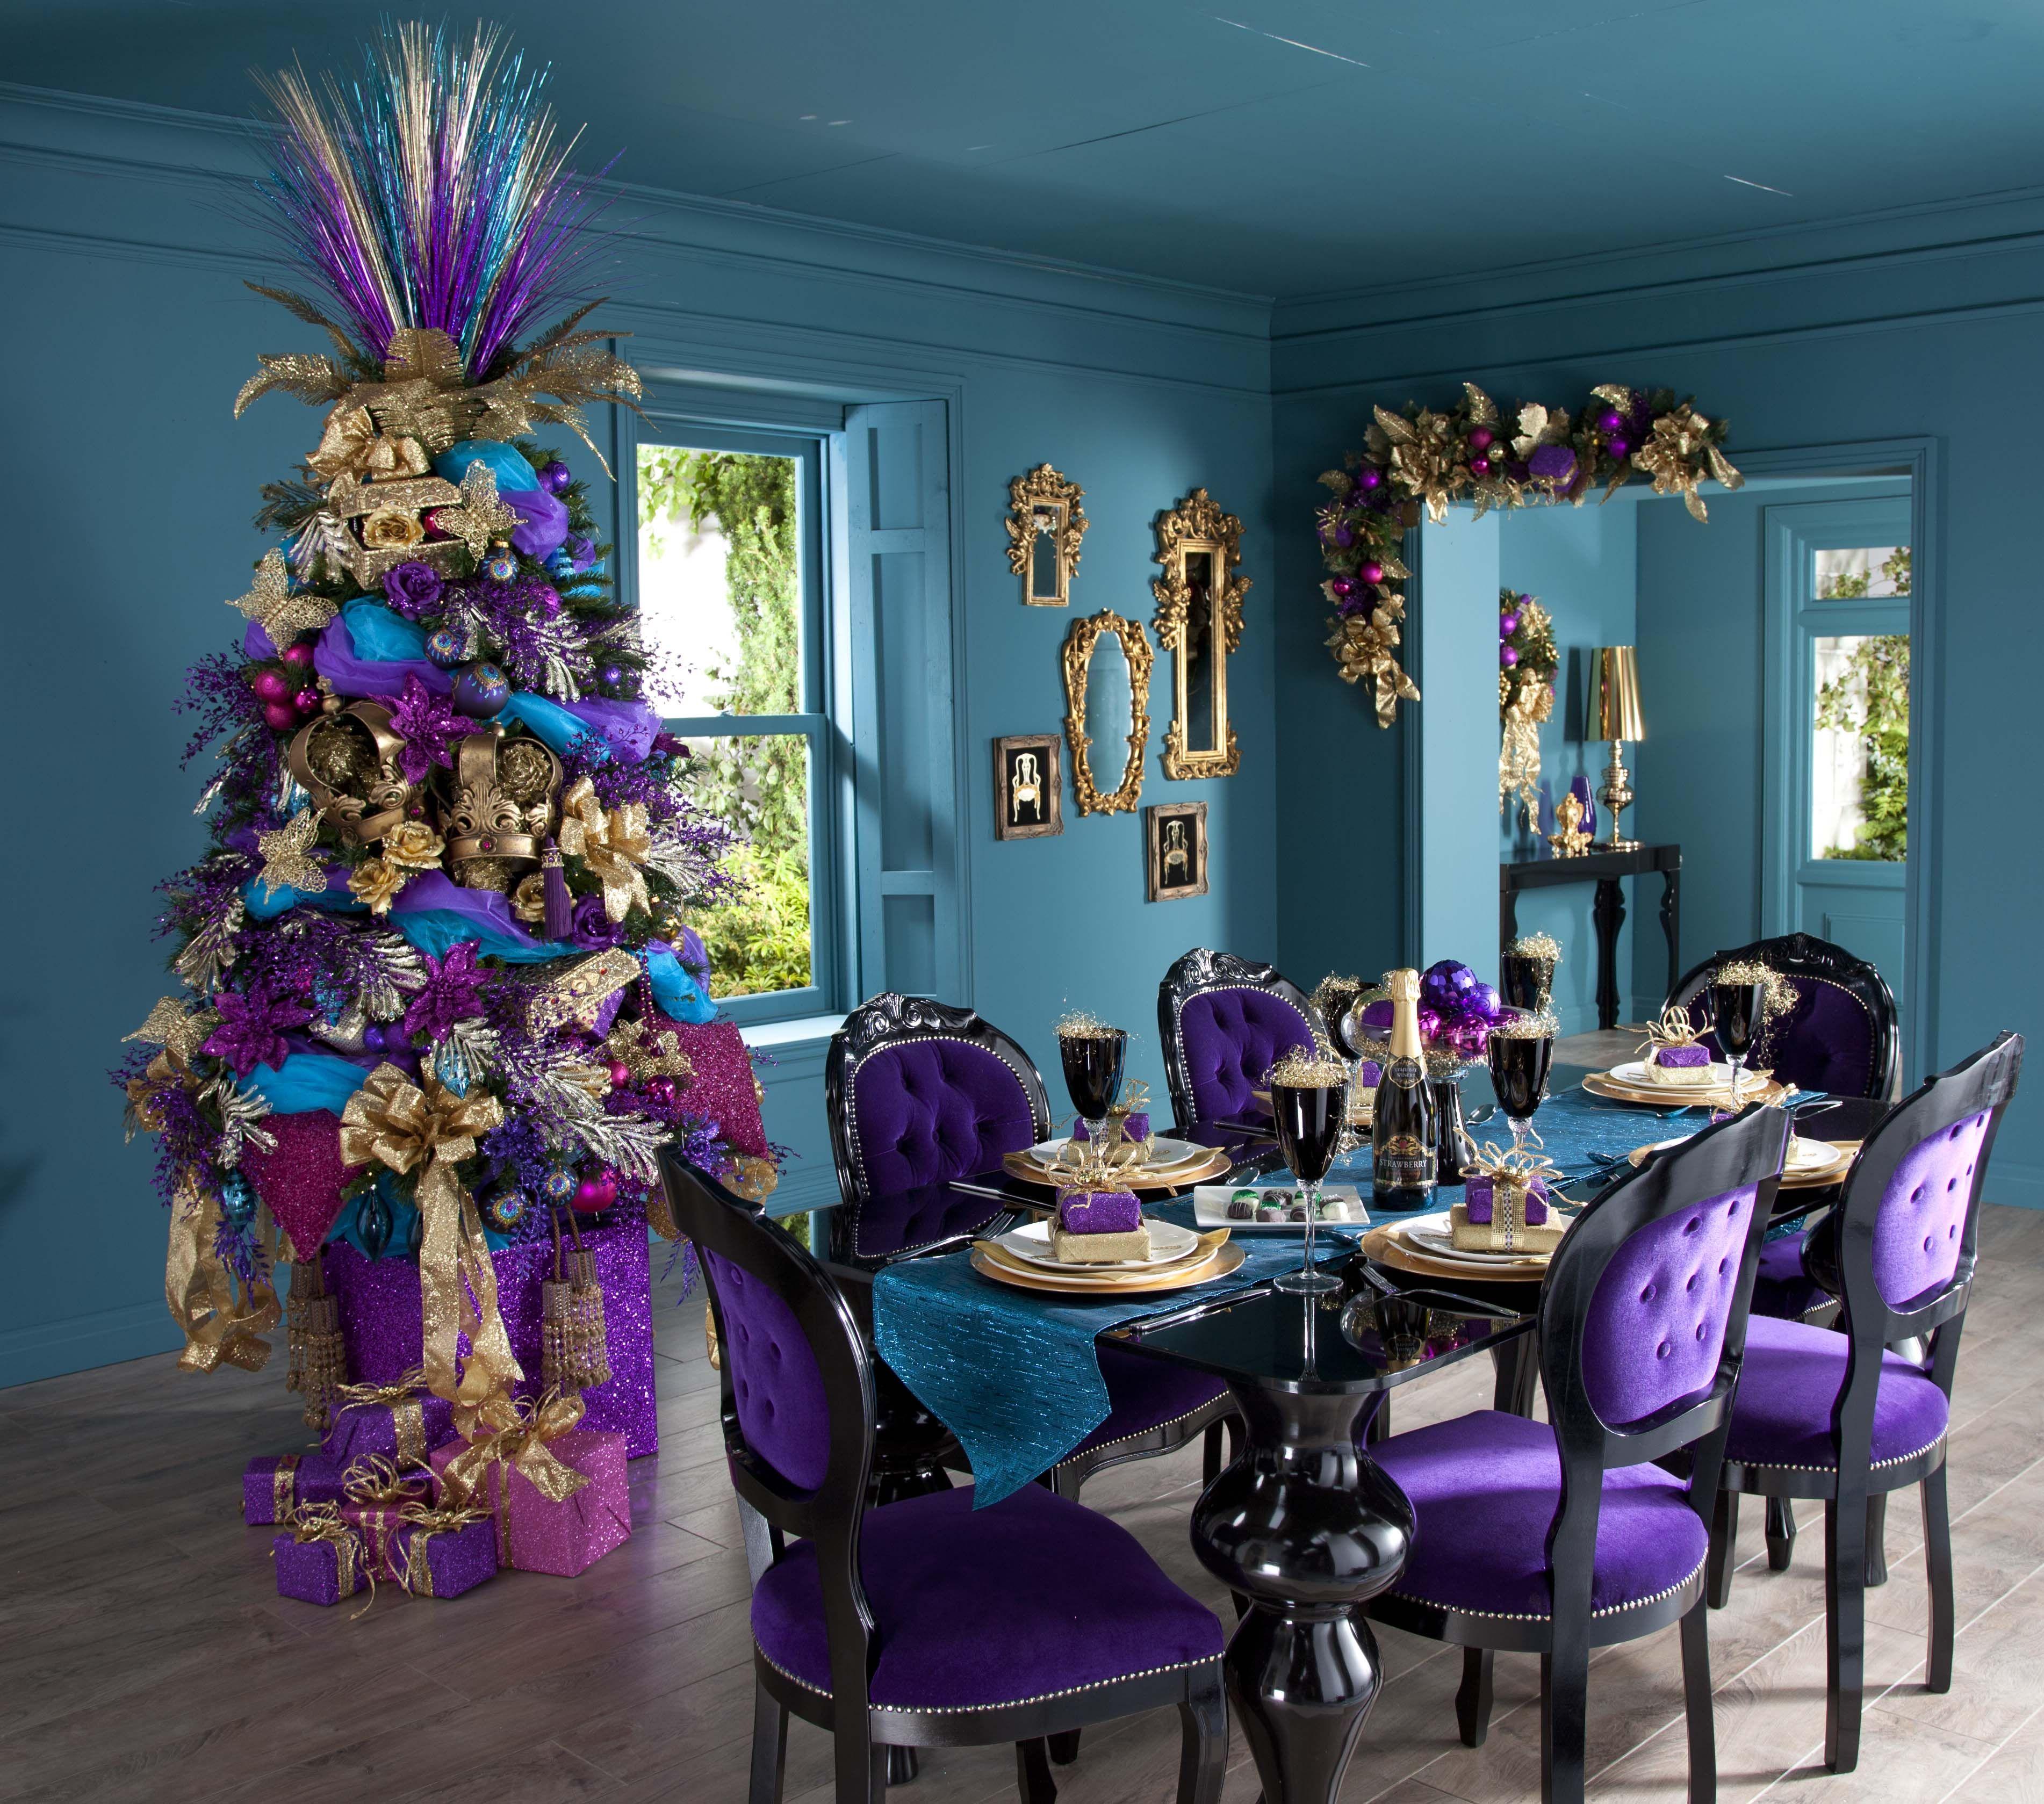 Christmas Table Decorations With Glamorous Purple Christmas Tree Beautifie Purple Christmas Tree Decorations Purple Christmas Decorations Purple Christmas Tree